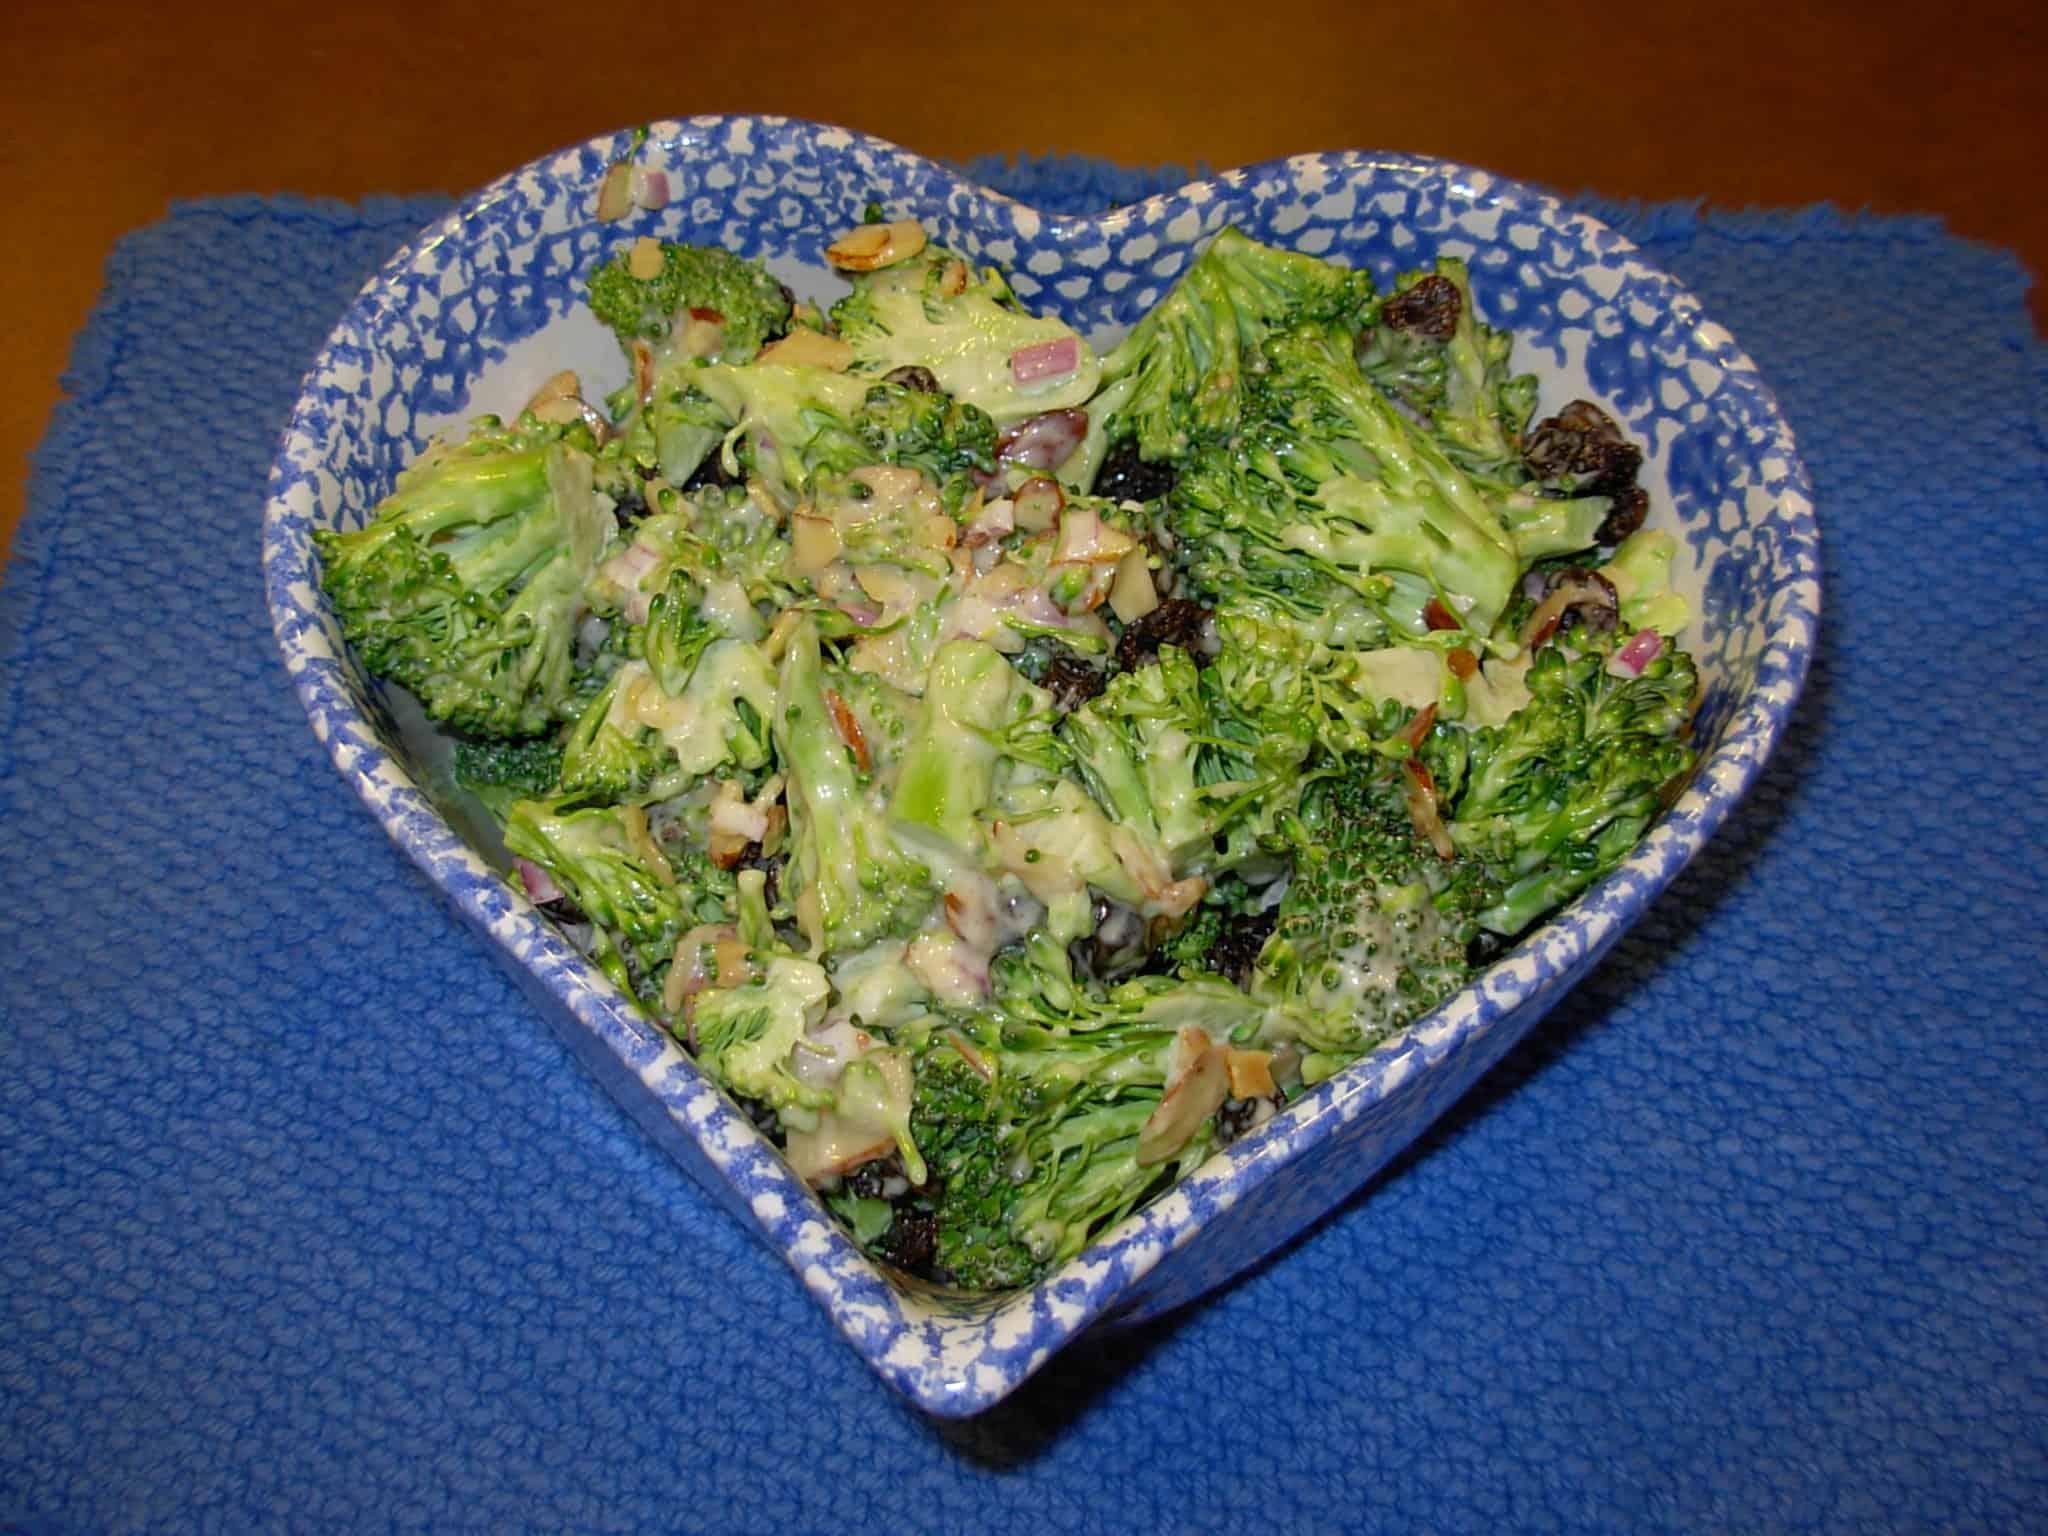 Roni's Favorite: Broccoli Salad